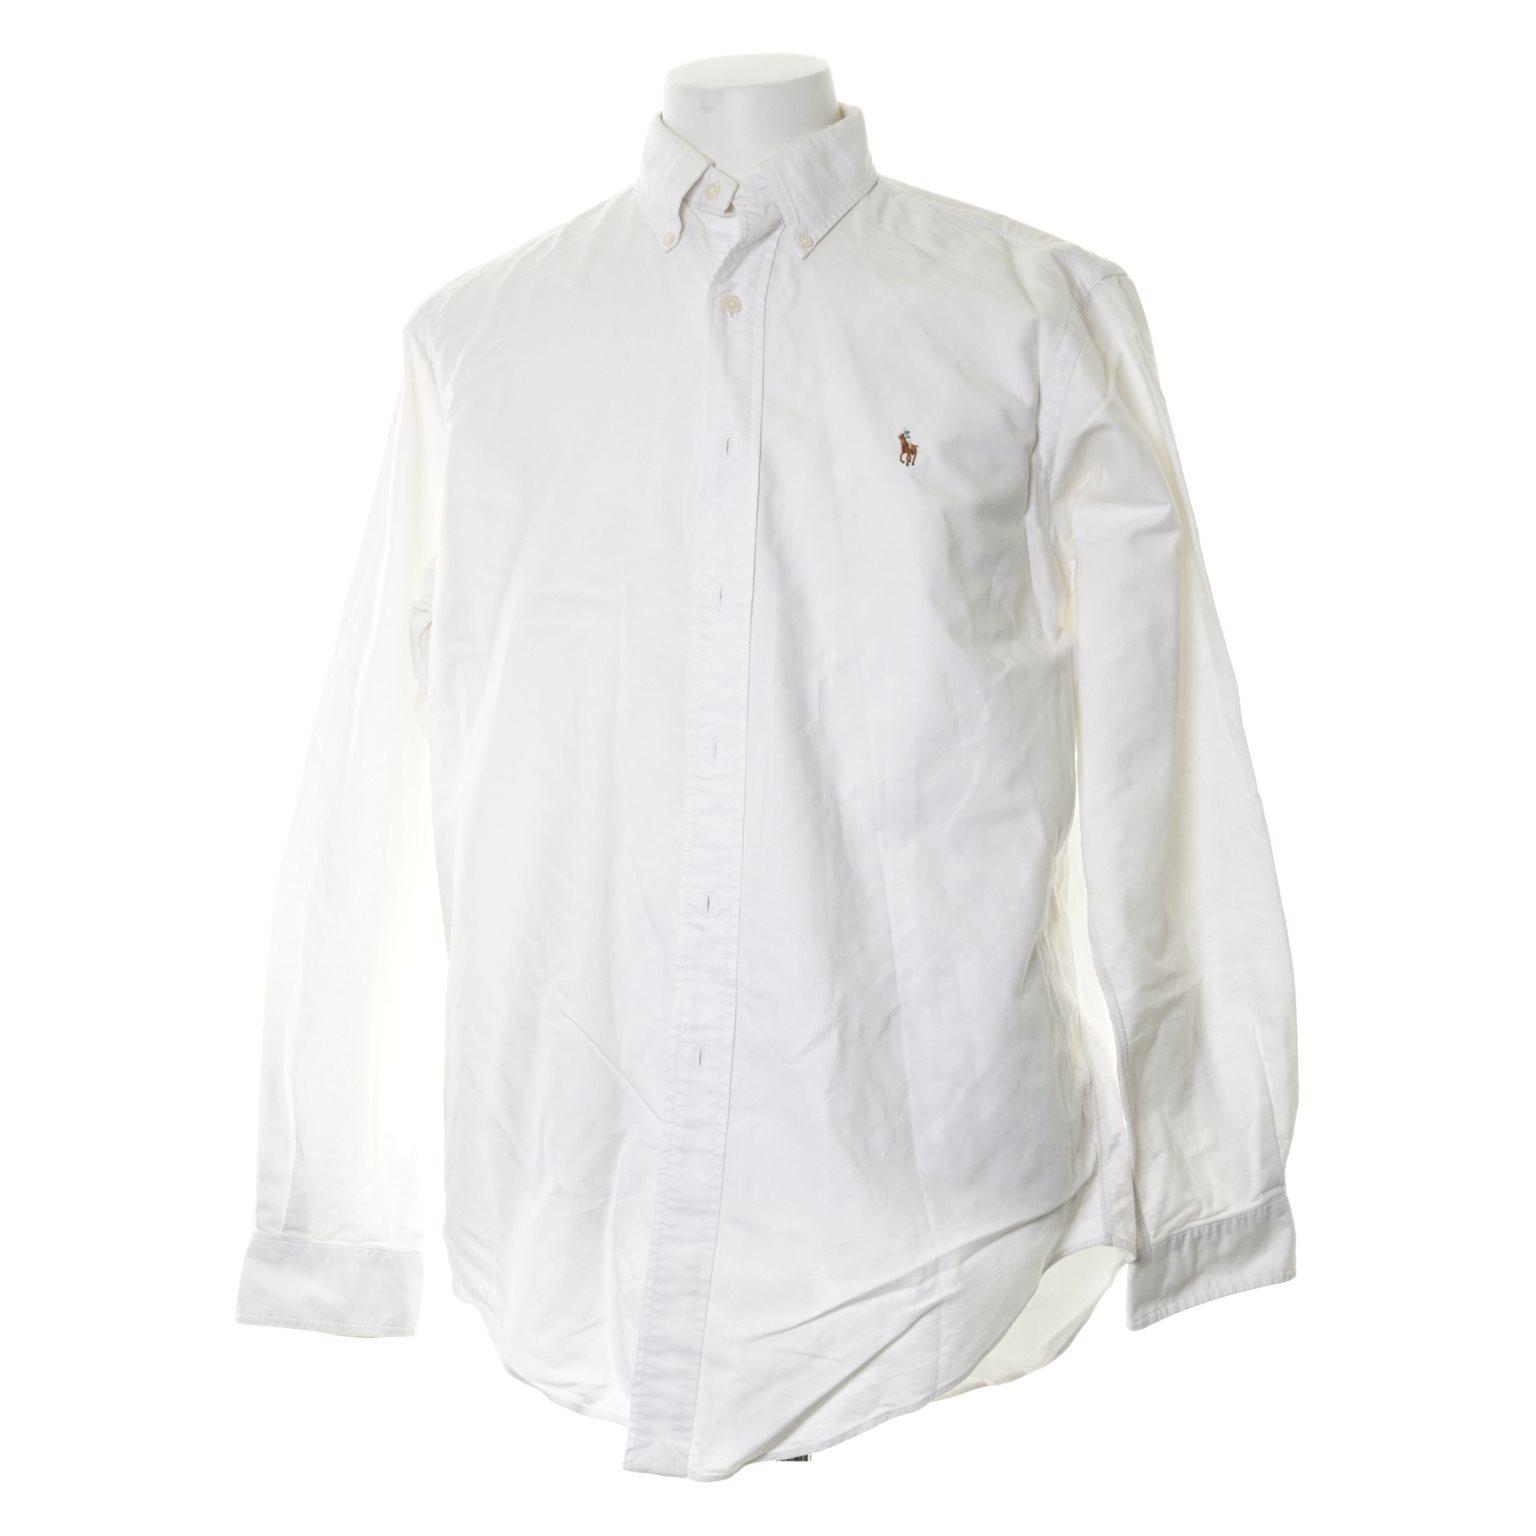 Polo Ralph Lauren, Skjorta, Strl: XL, Vit